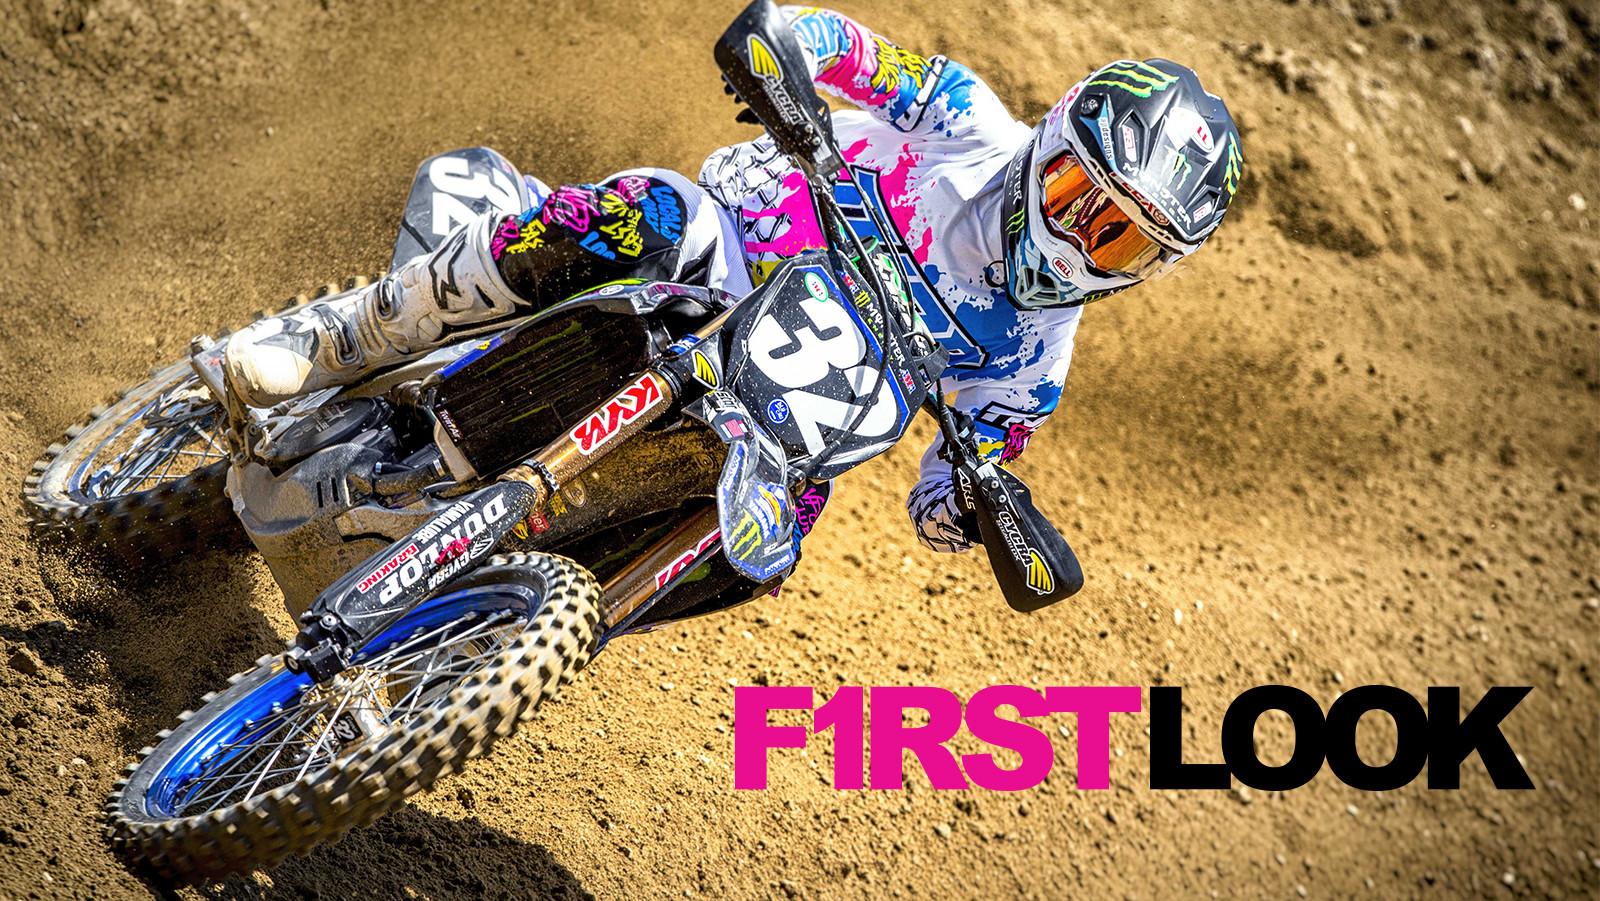 First Look 2020 Thor Mx Motocross Gear Motocross Feature Stories Vital Mx